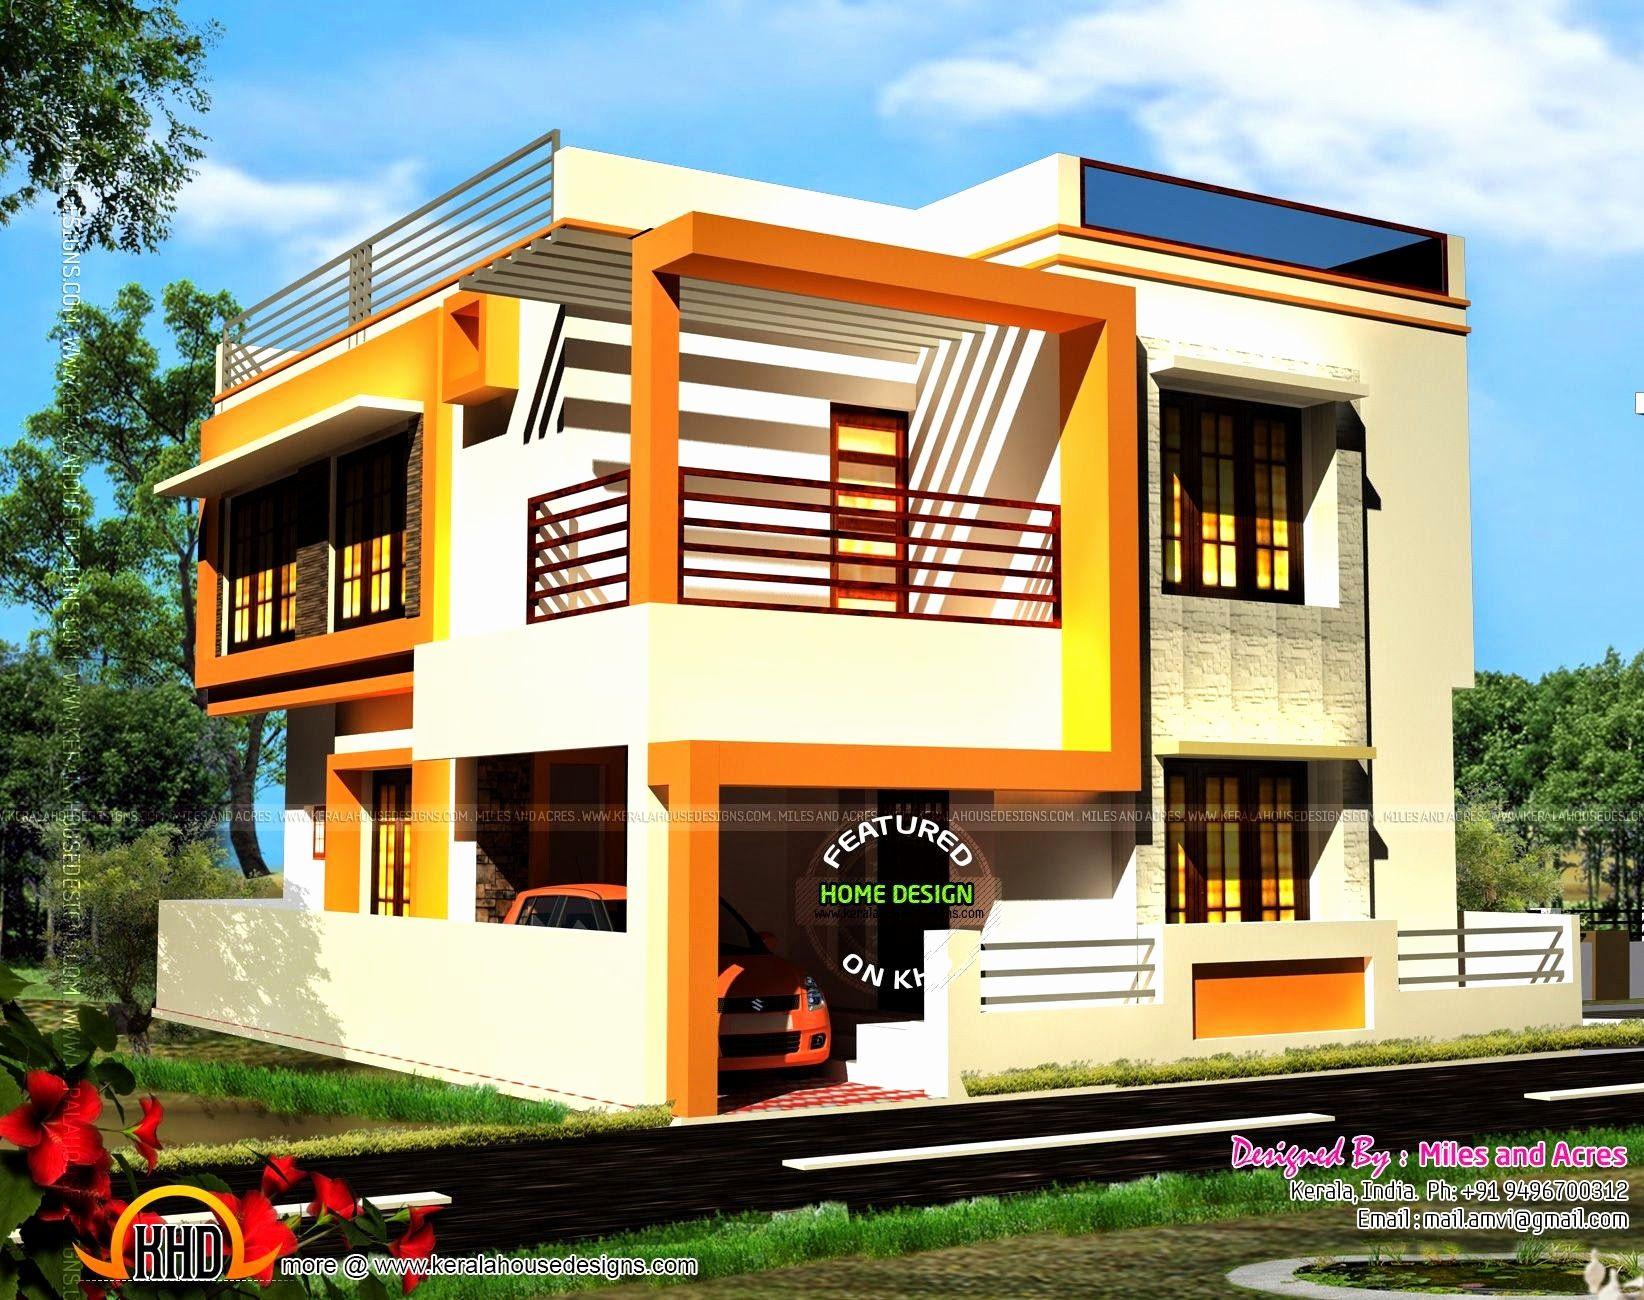 Exterior Home Design Paint Colour India Inspiring Home Design Ideas House Outer Design Best Home Interior Design Small House Exterior Paint